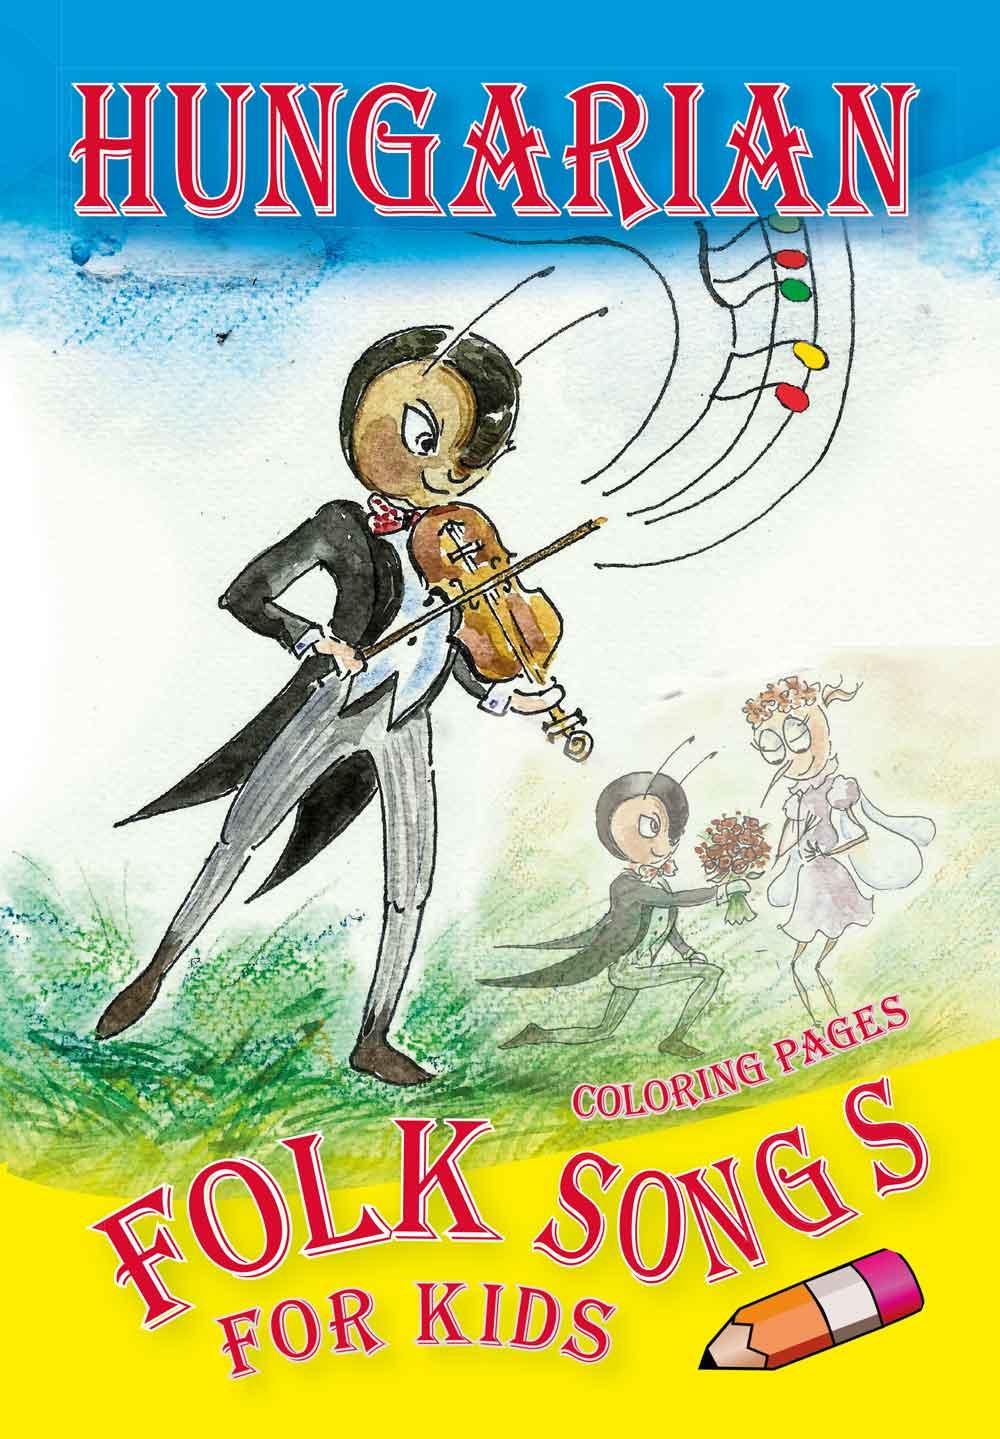 Kolozsvári Ildikó - Hungarian Folk Songs for kids